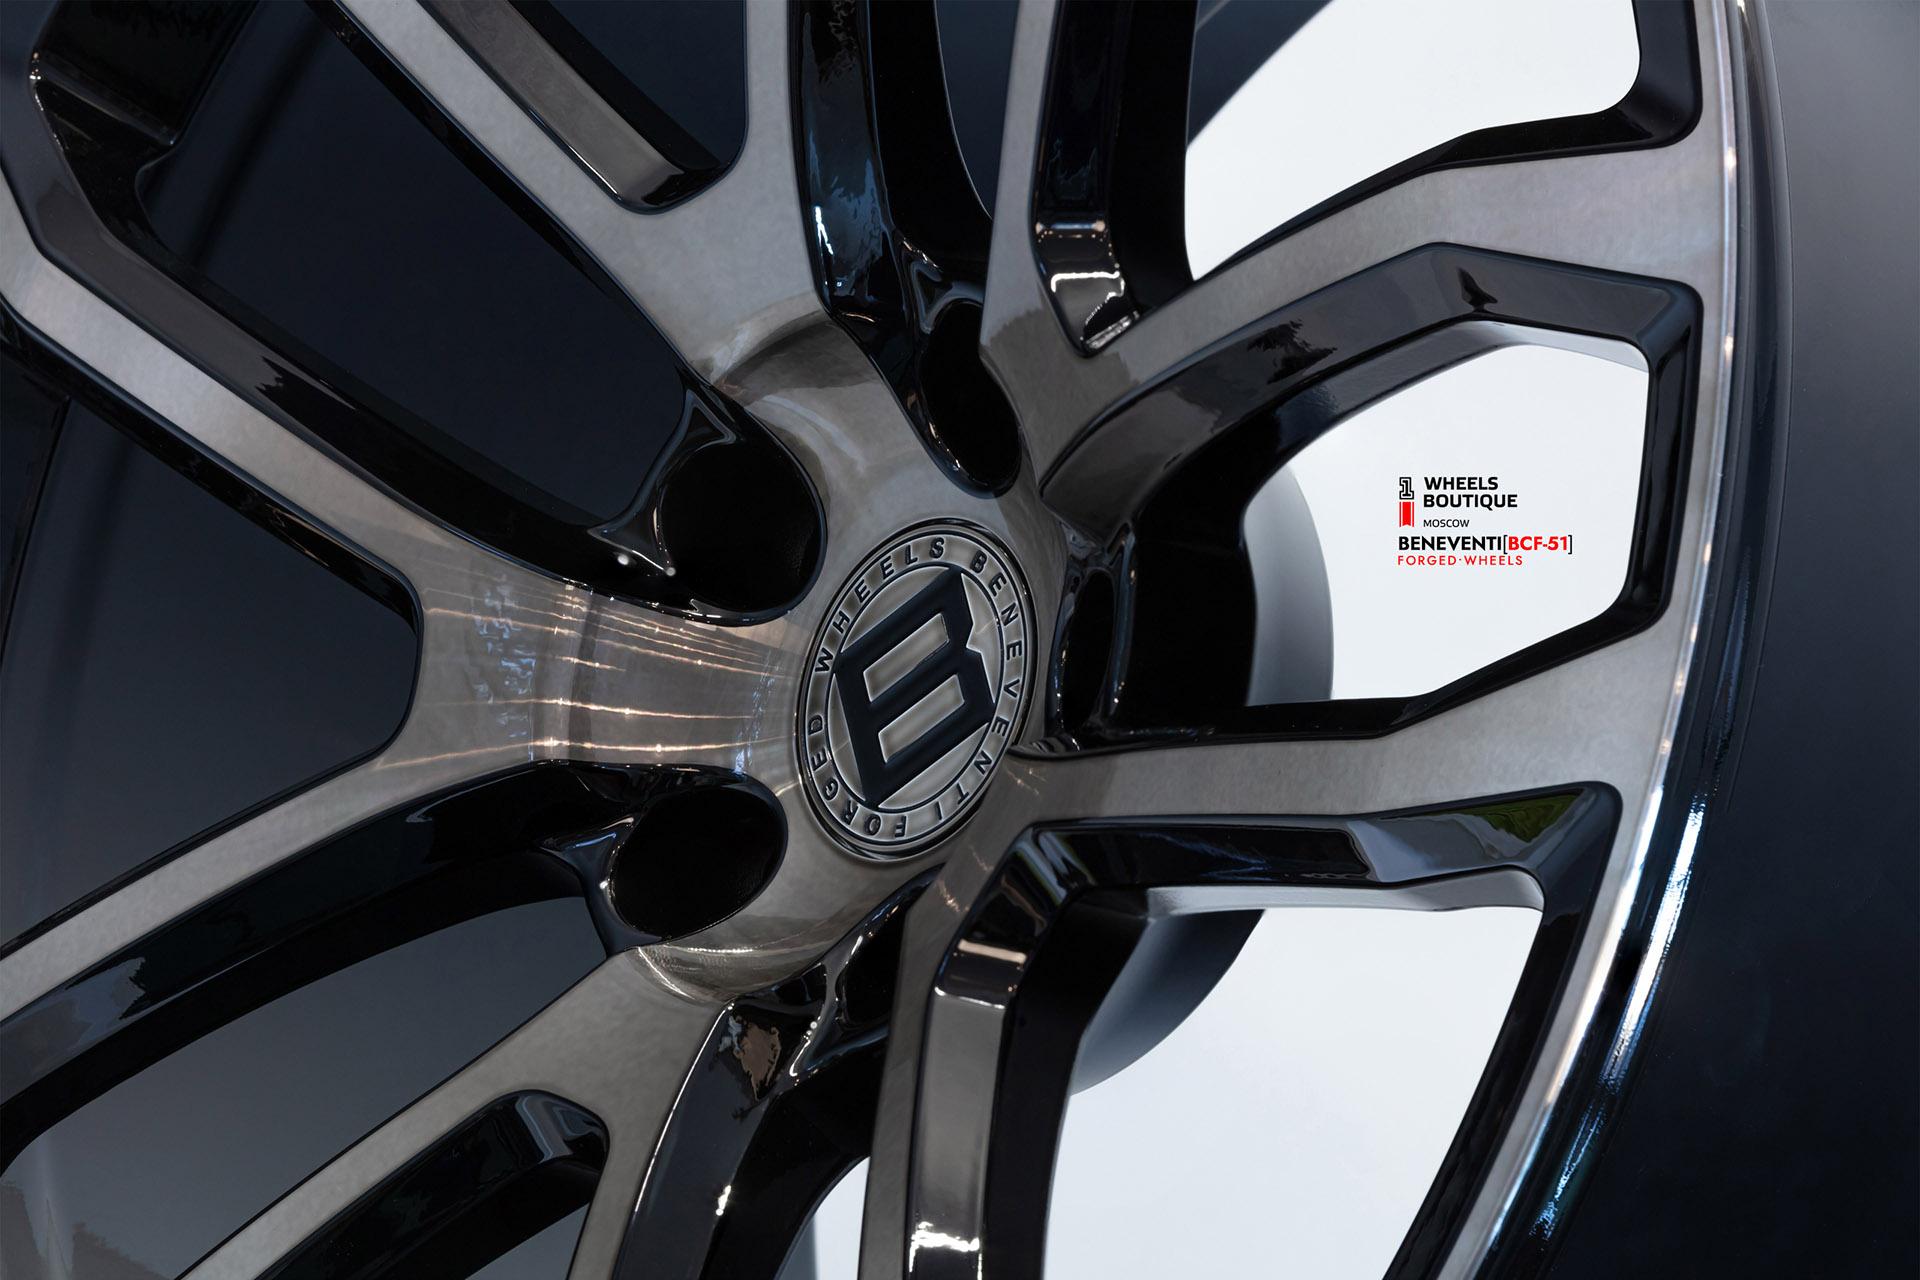 Beneventi Custom Forged - BCF-51 в отделке Shadow Diamond - Темный бриллиант для BMW X6 Widebody